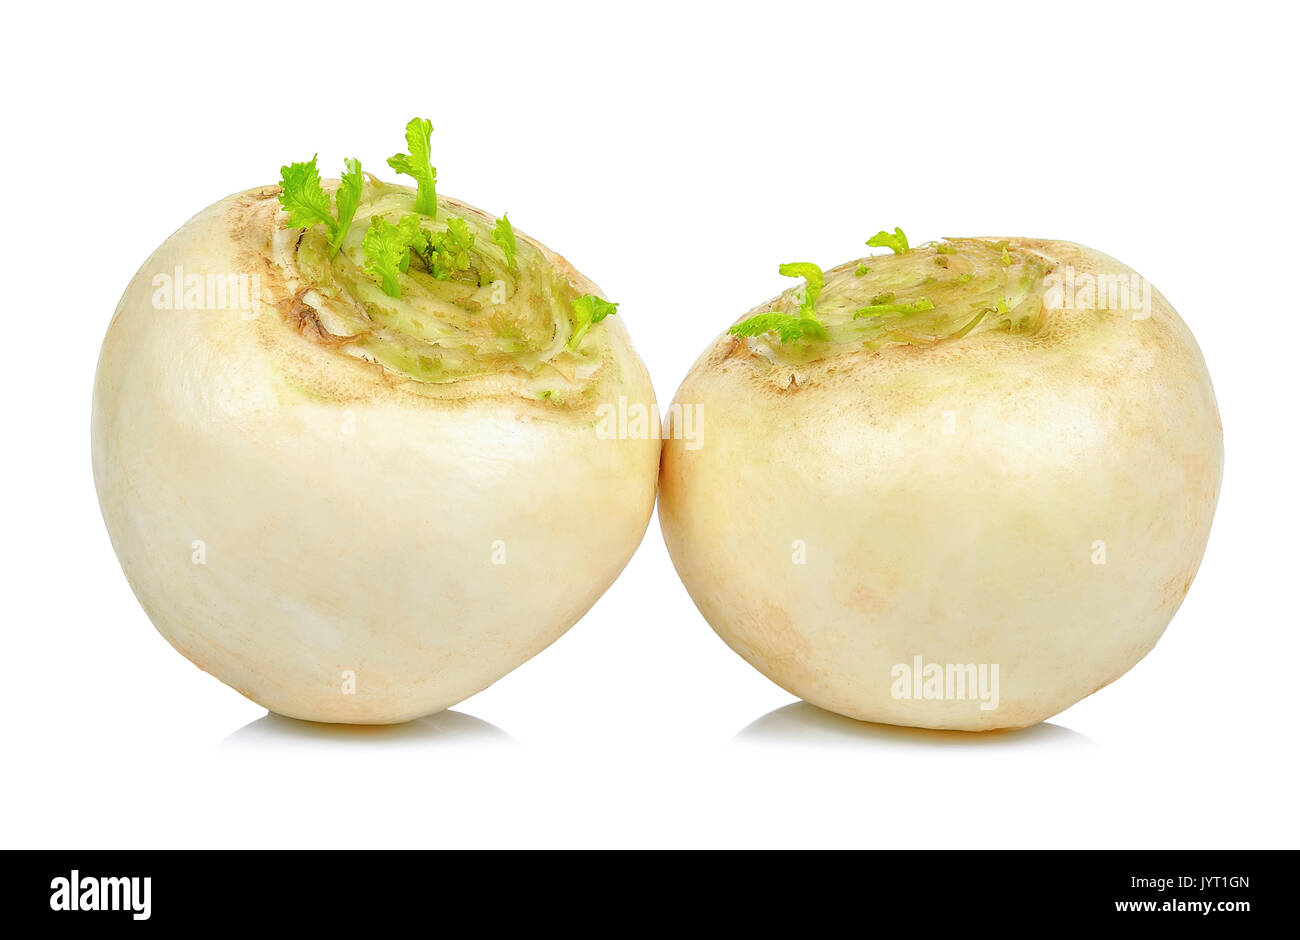 White turnip isolated on the white background. - Stock Image